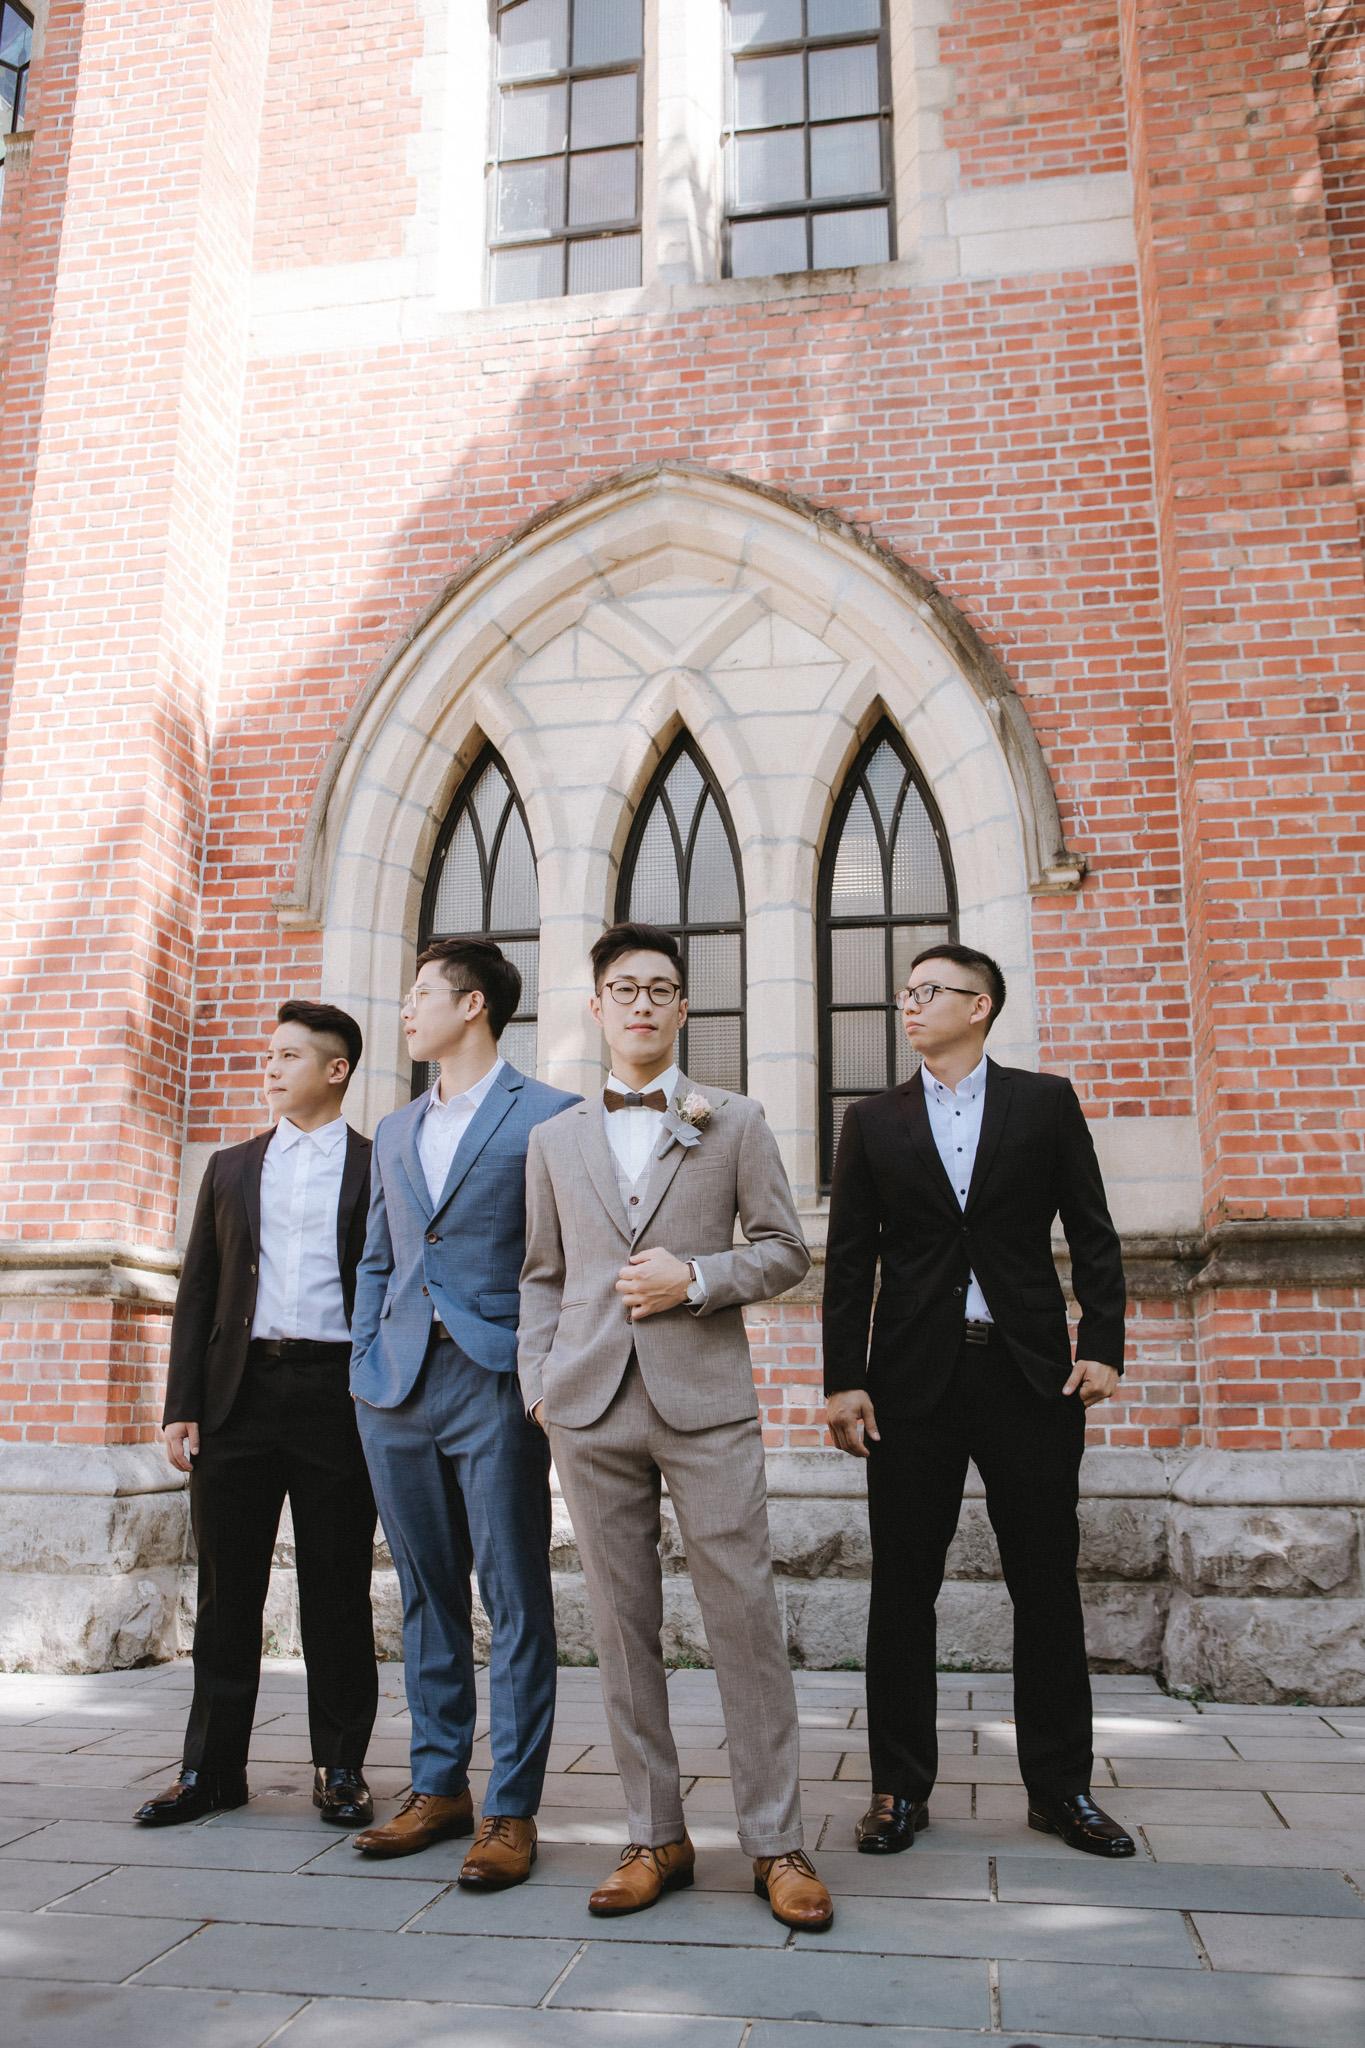 EW 台北婚攝 居米 濟南教會 Brick Yard 33 美軍俱樂部 婚禮 婚宴-17